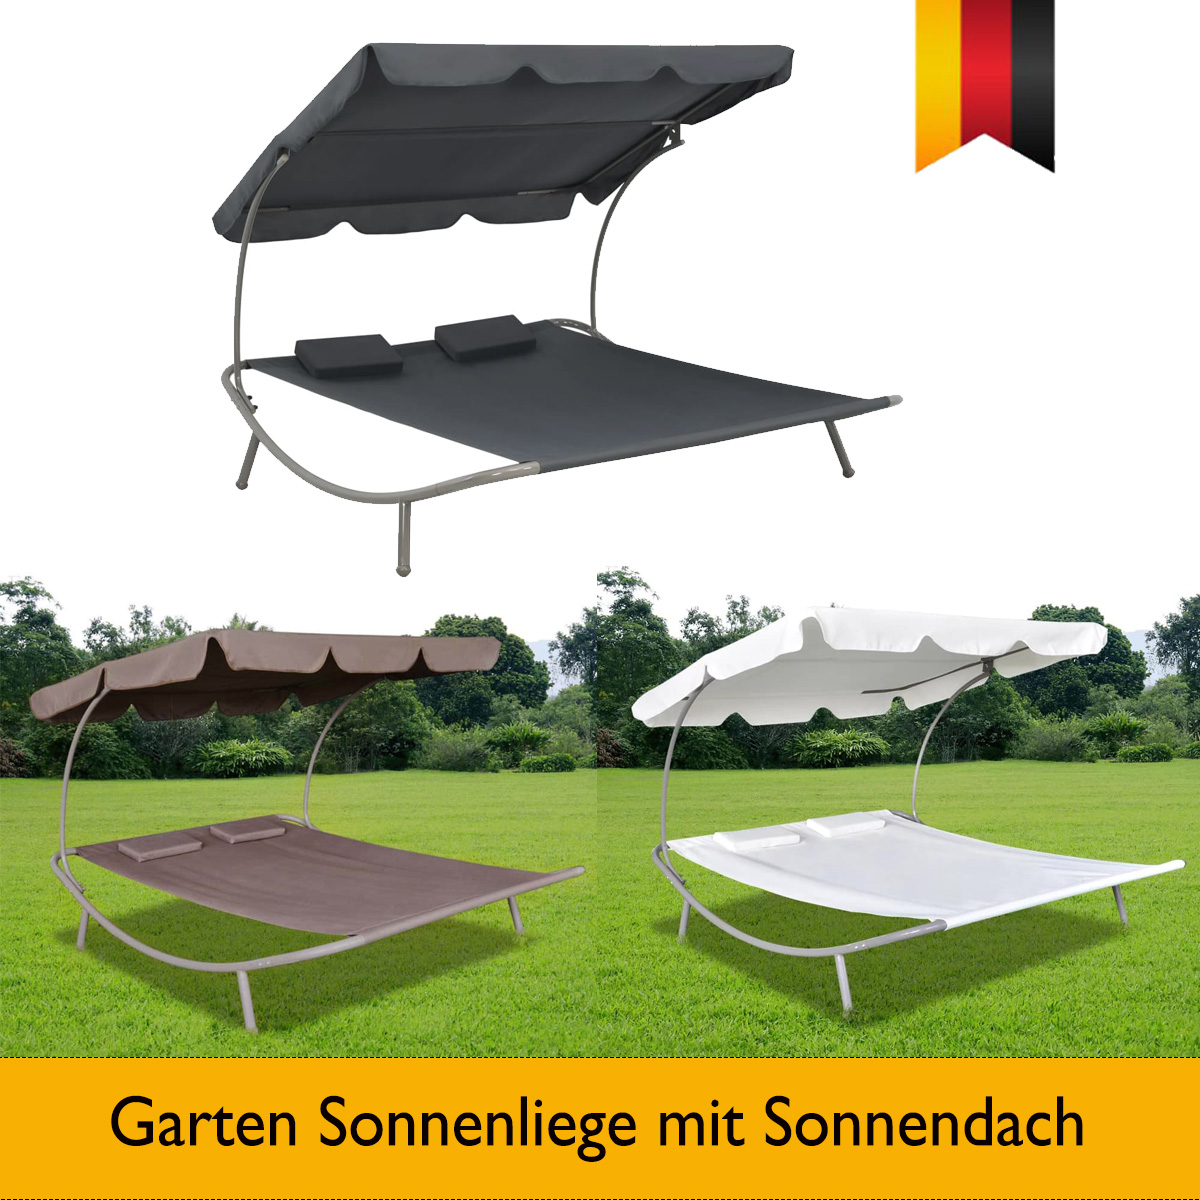 Full Size of Bauhaus Gartenliege Sonnenliege Fr Zwei Trendy Affordable Aluminium Fenster Wohnzimmer Bauhaus Gartenliege